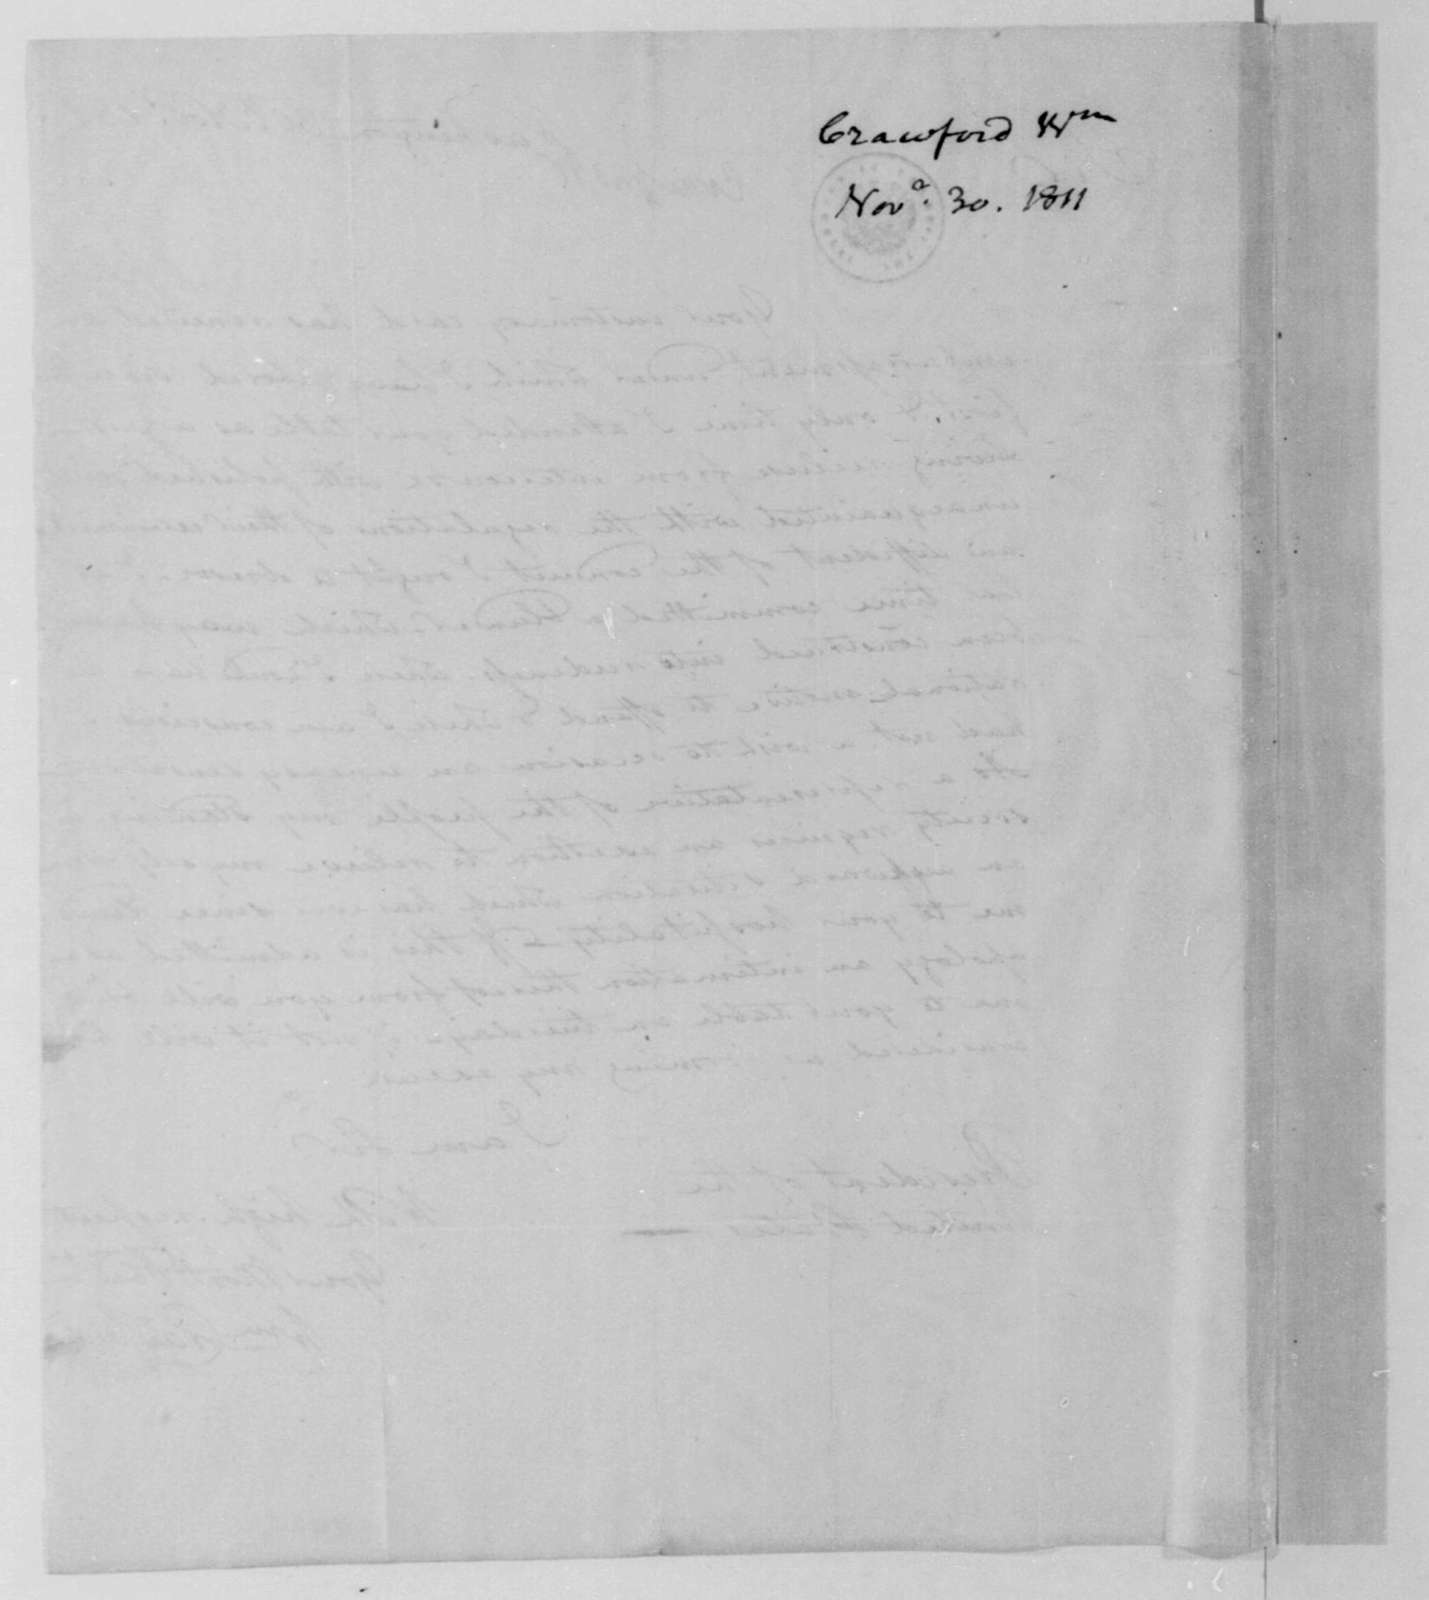 William Crawford to James Madison, November 30, 1811.